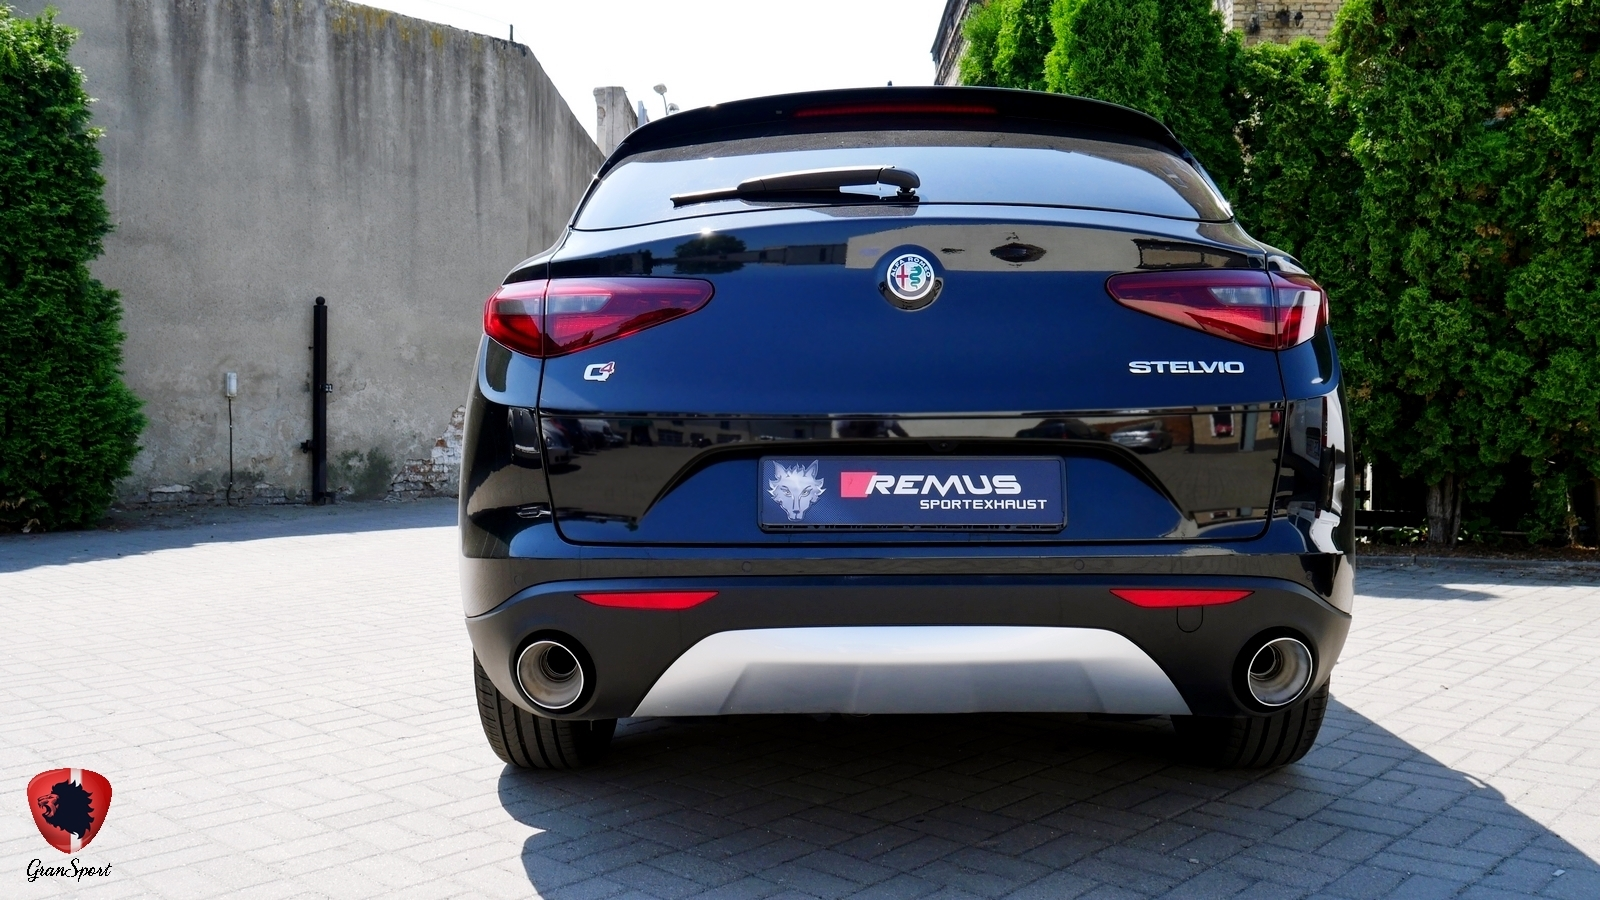 Alfa Romeo Stelvio Remus